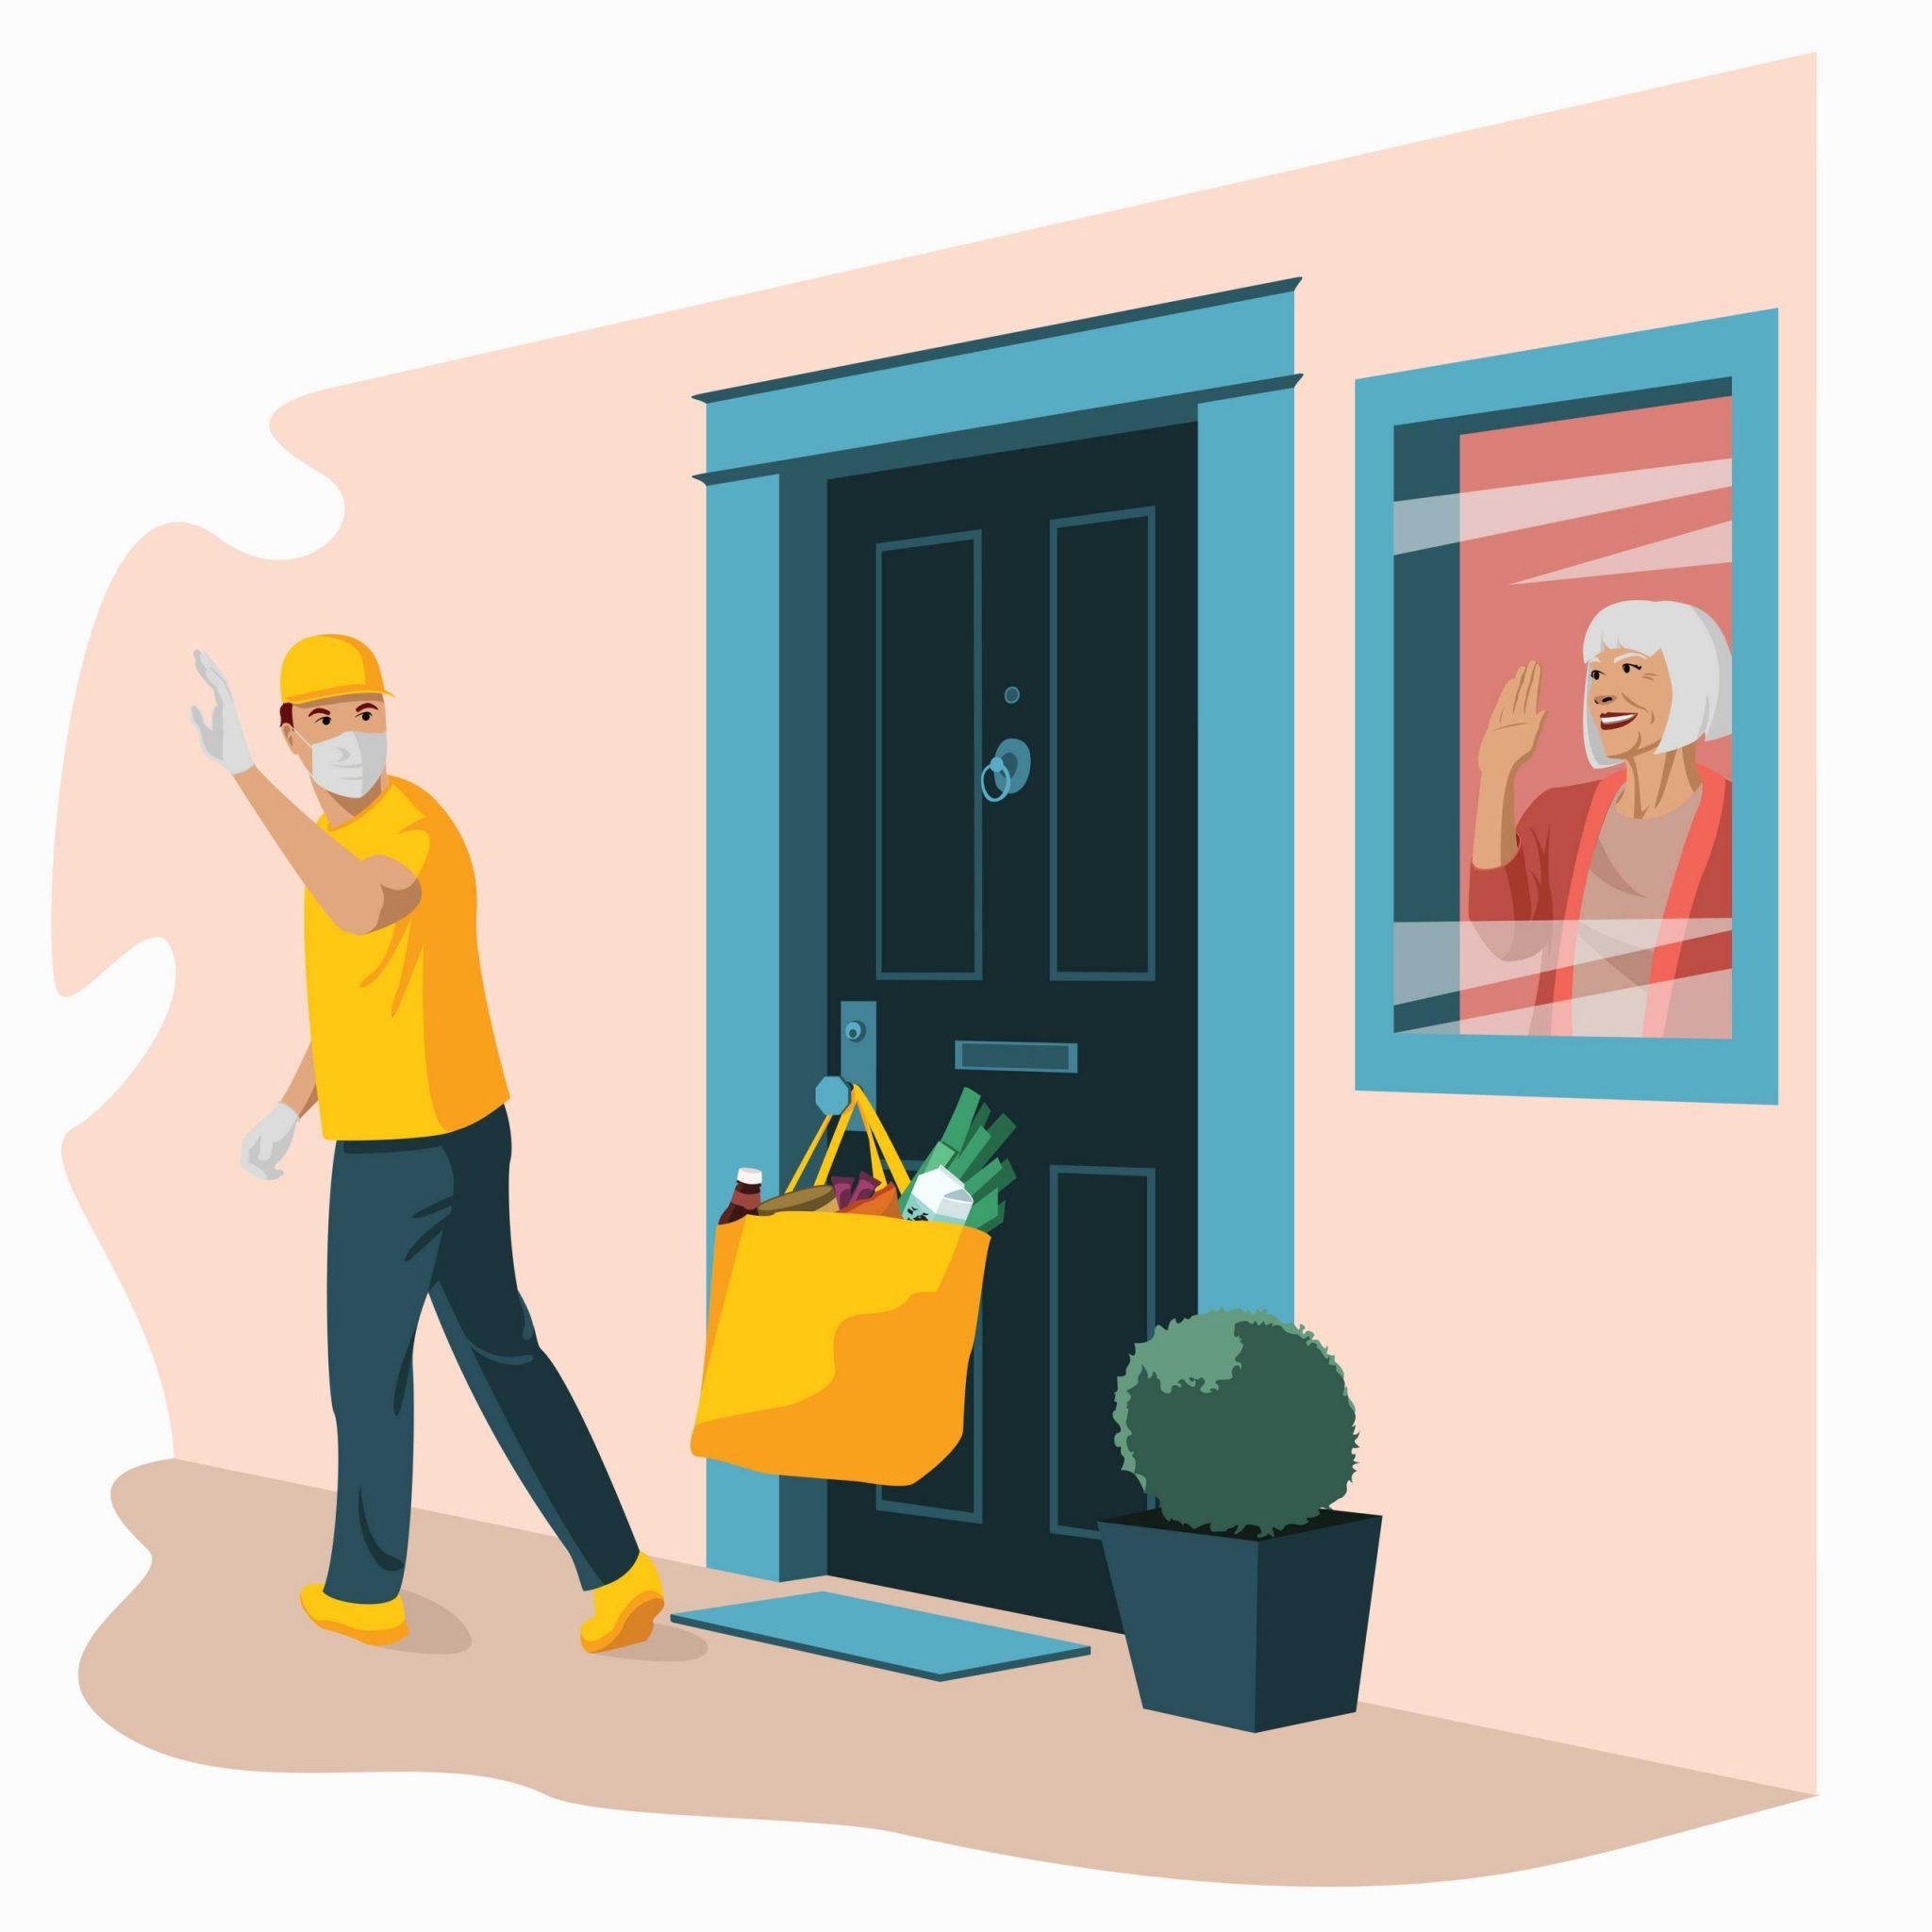 Home delivery during Coronavirus quarantine